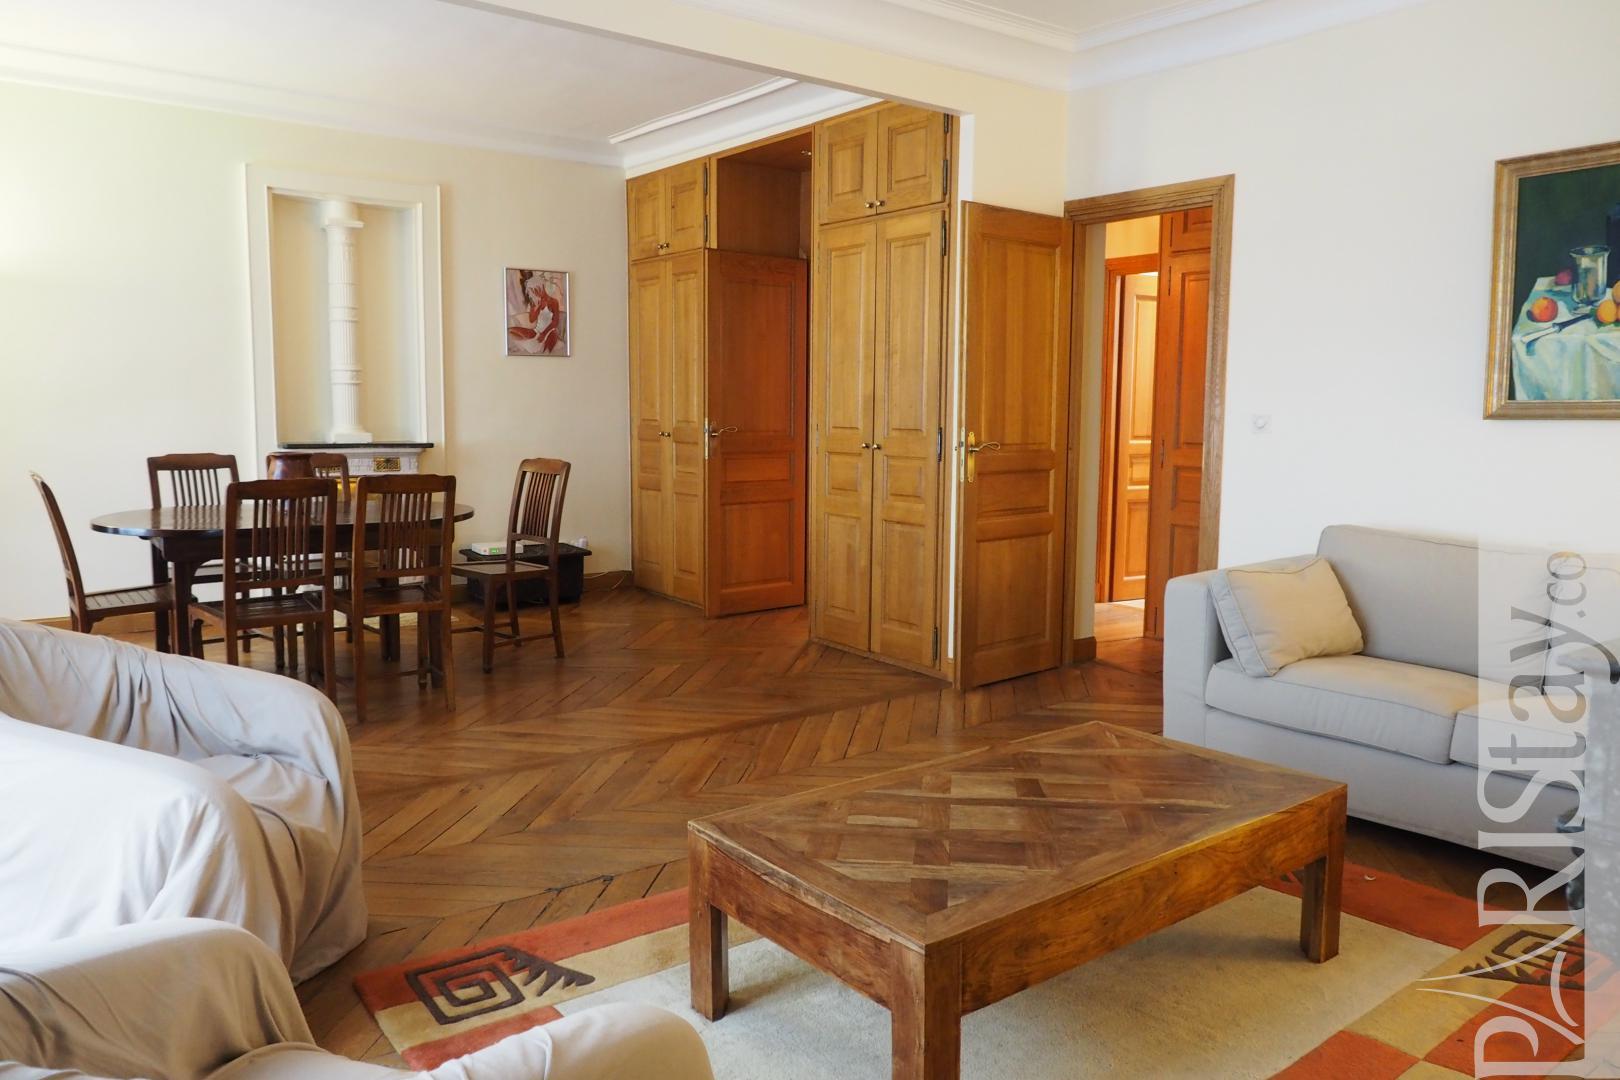 1 Bedroom Apartment Long Term Rentals Place Des Ternes 75017 Paris